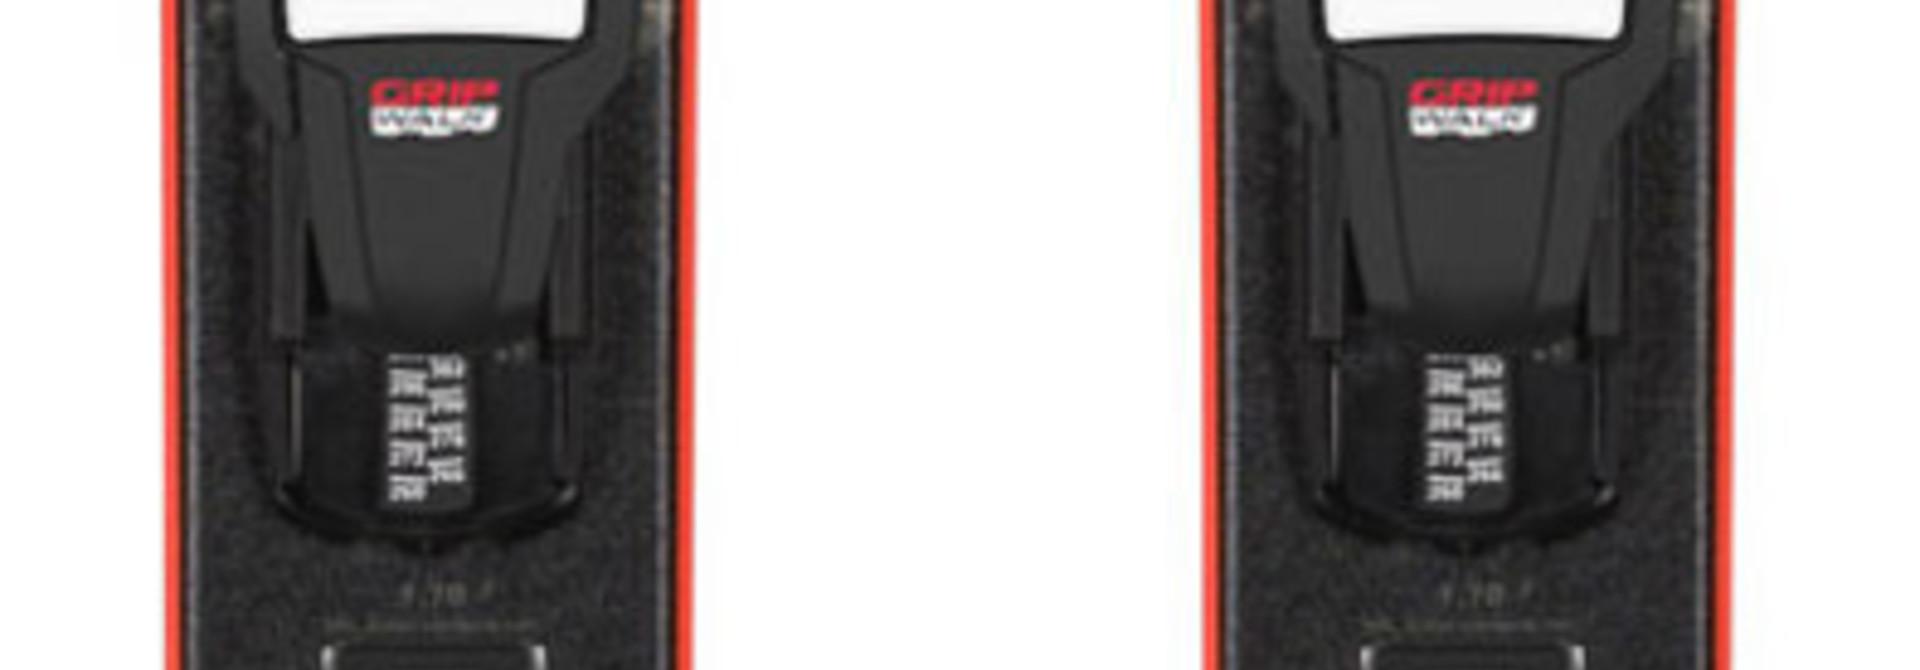 BLACKOPS SMASHER XP10